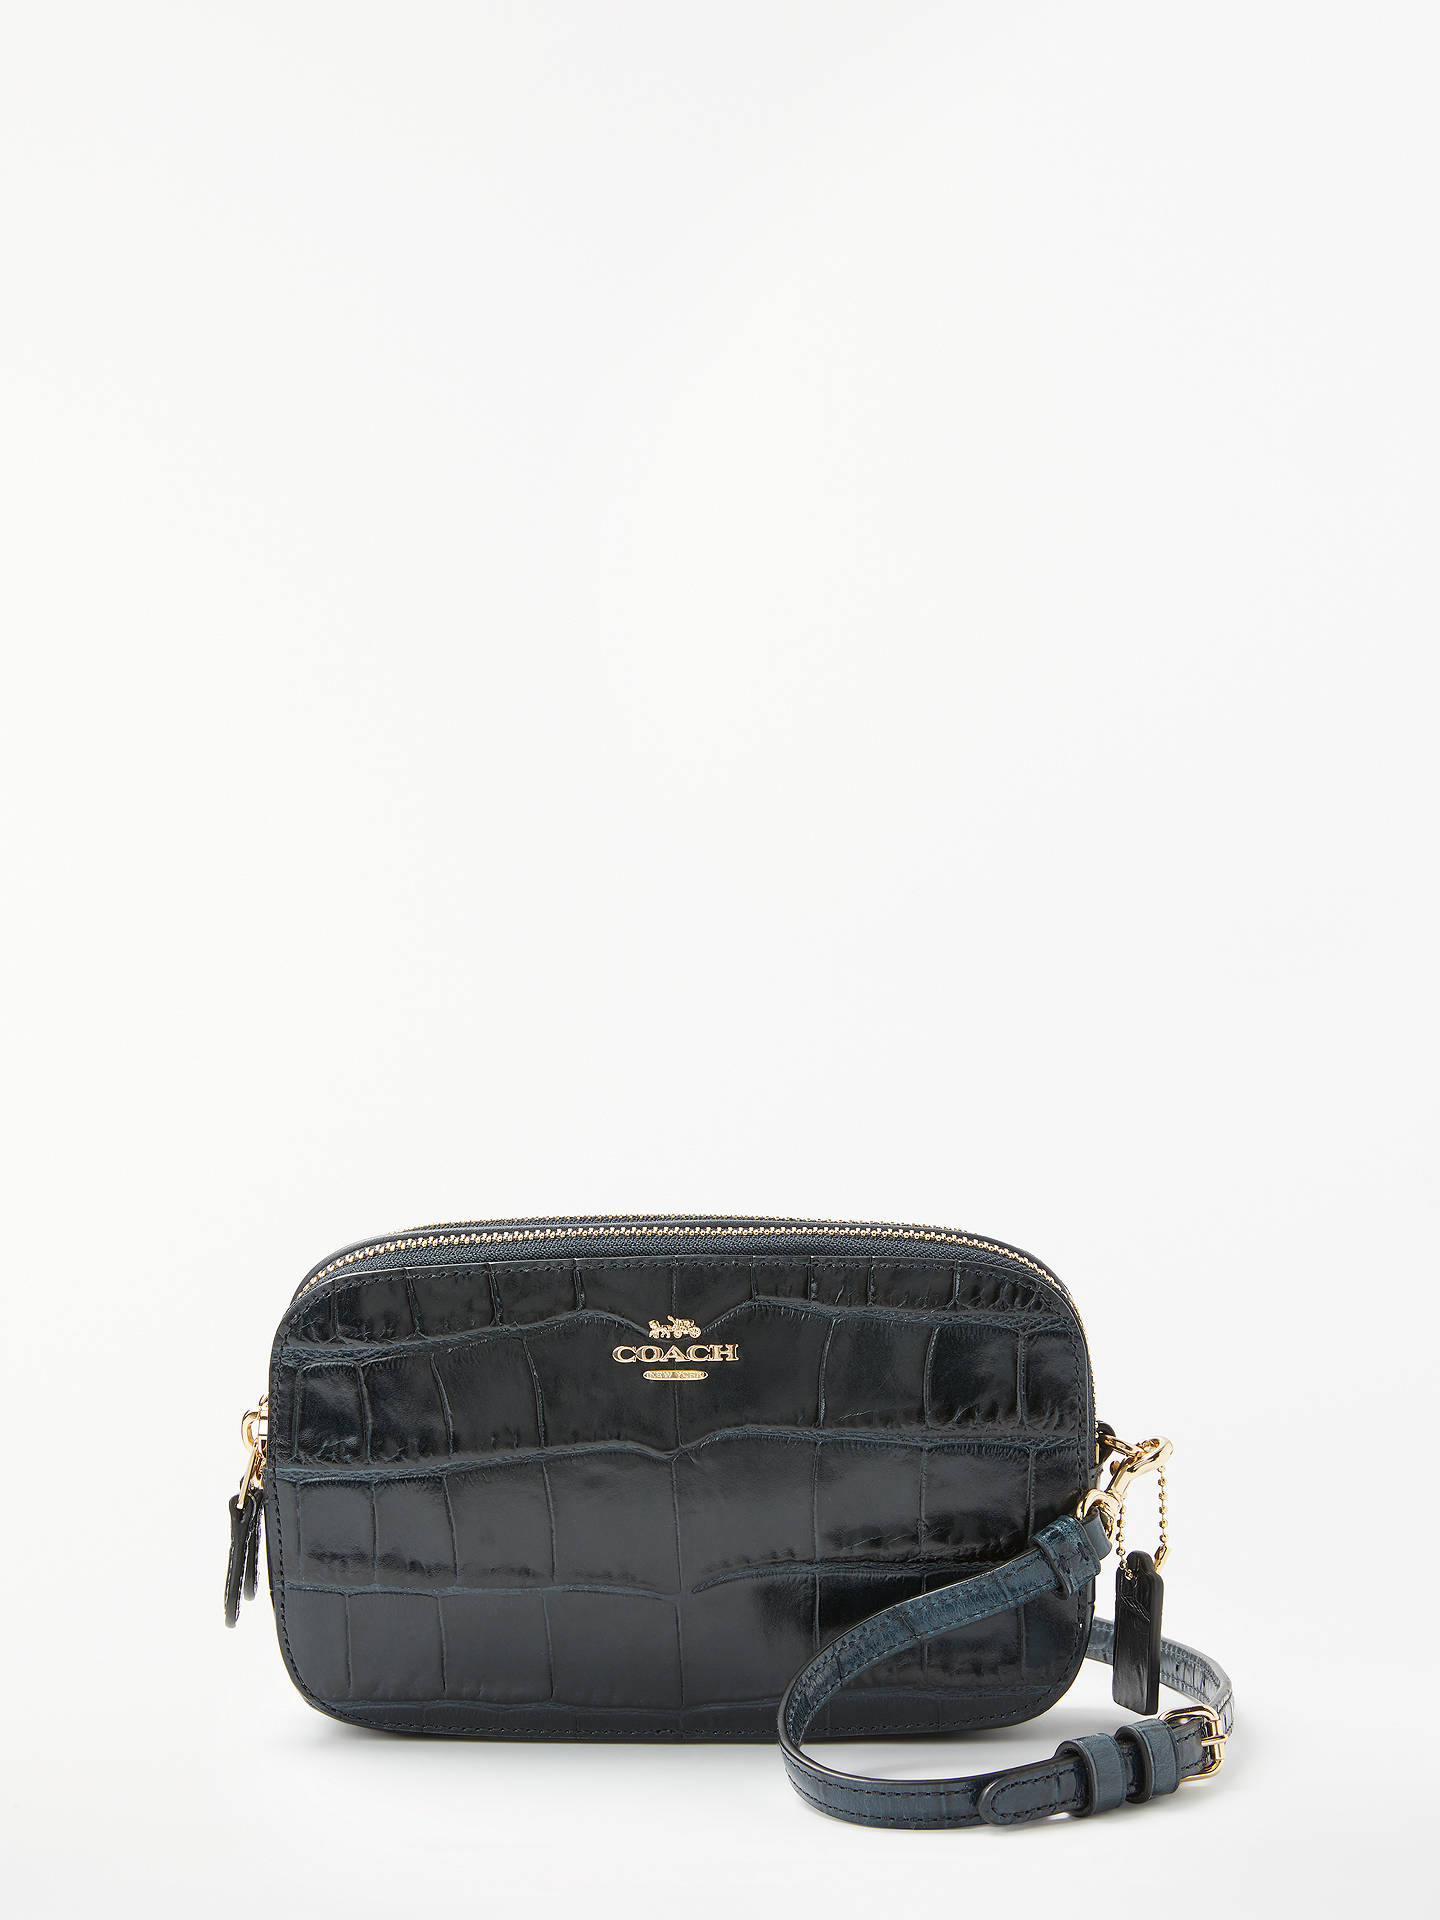 3685d2f39449 Coach Croc Cross Body Bag at John Lewis   Partners